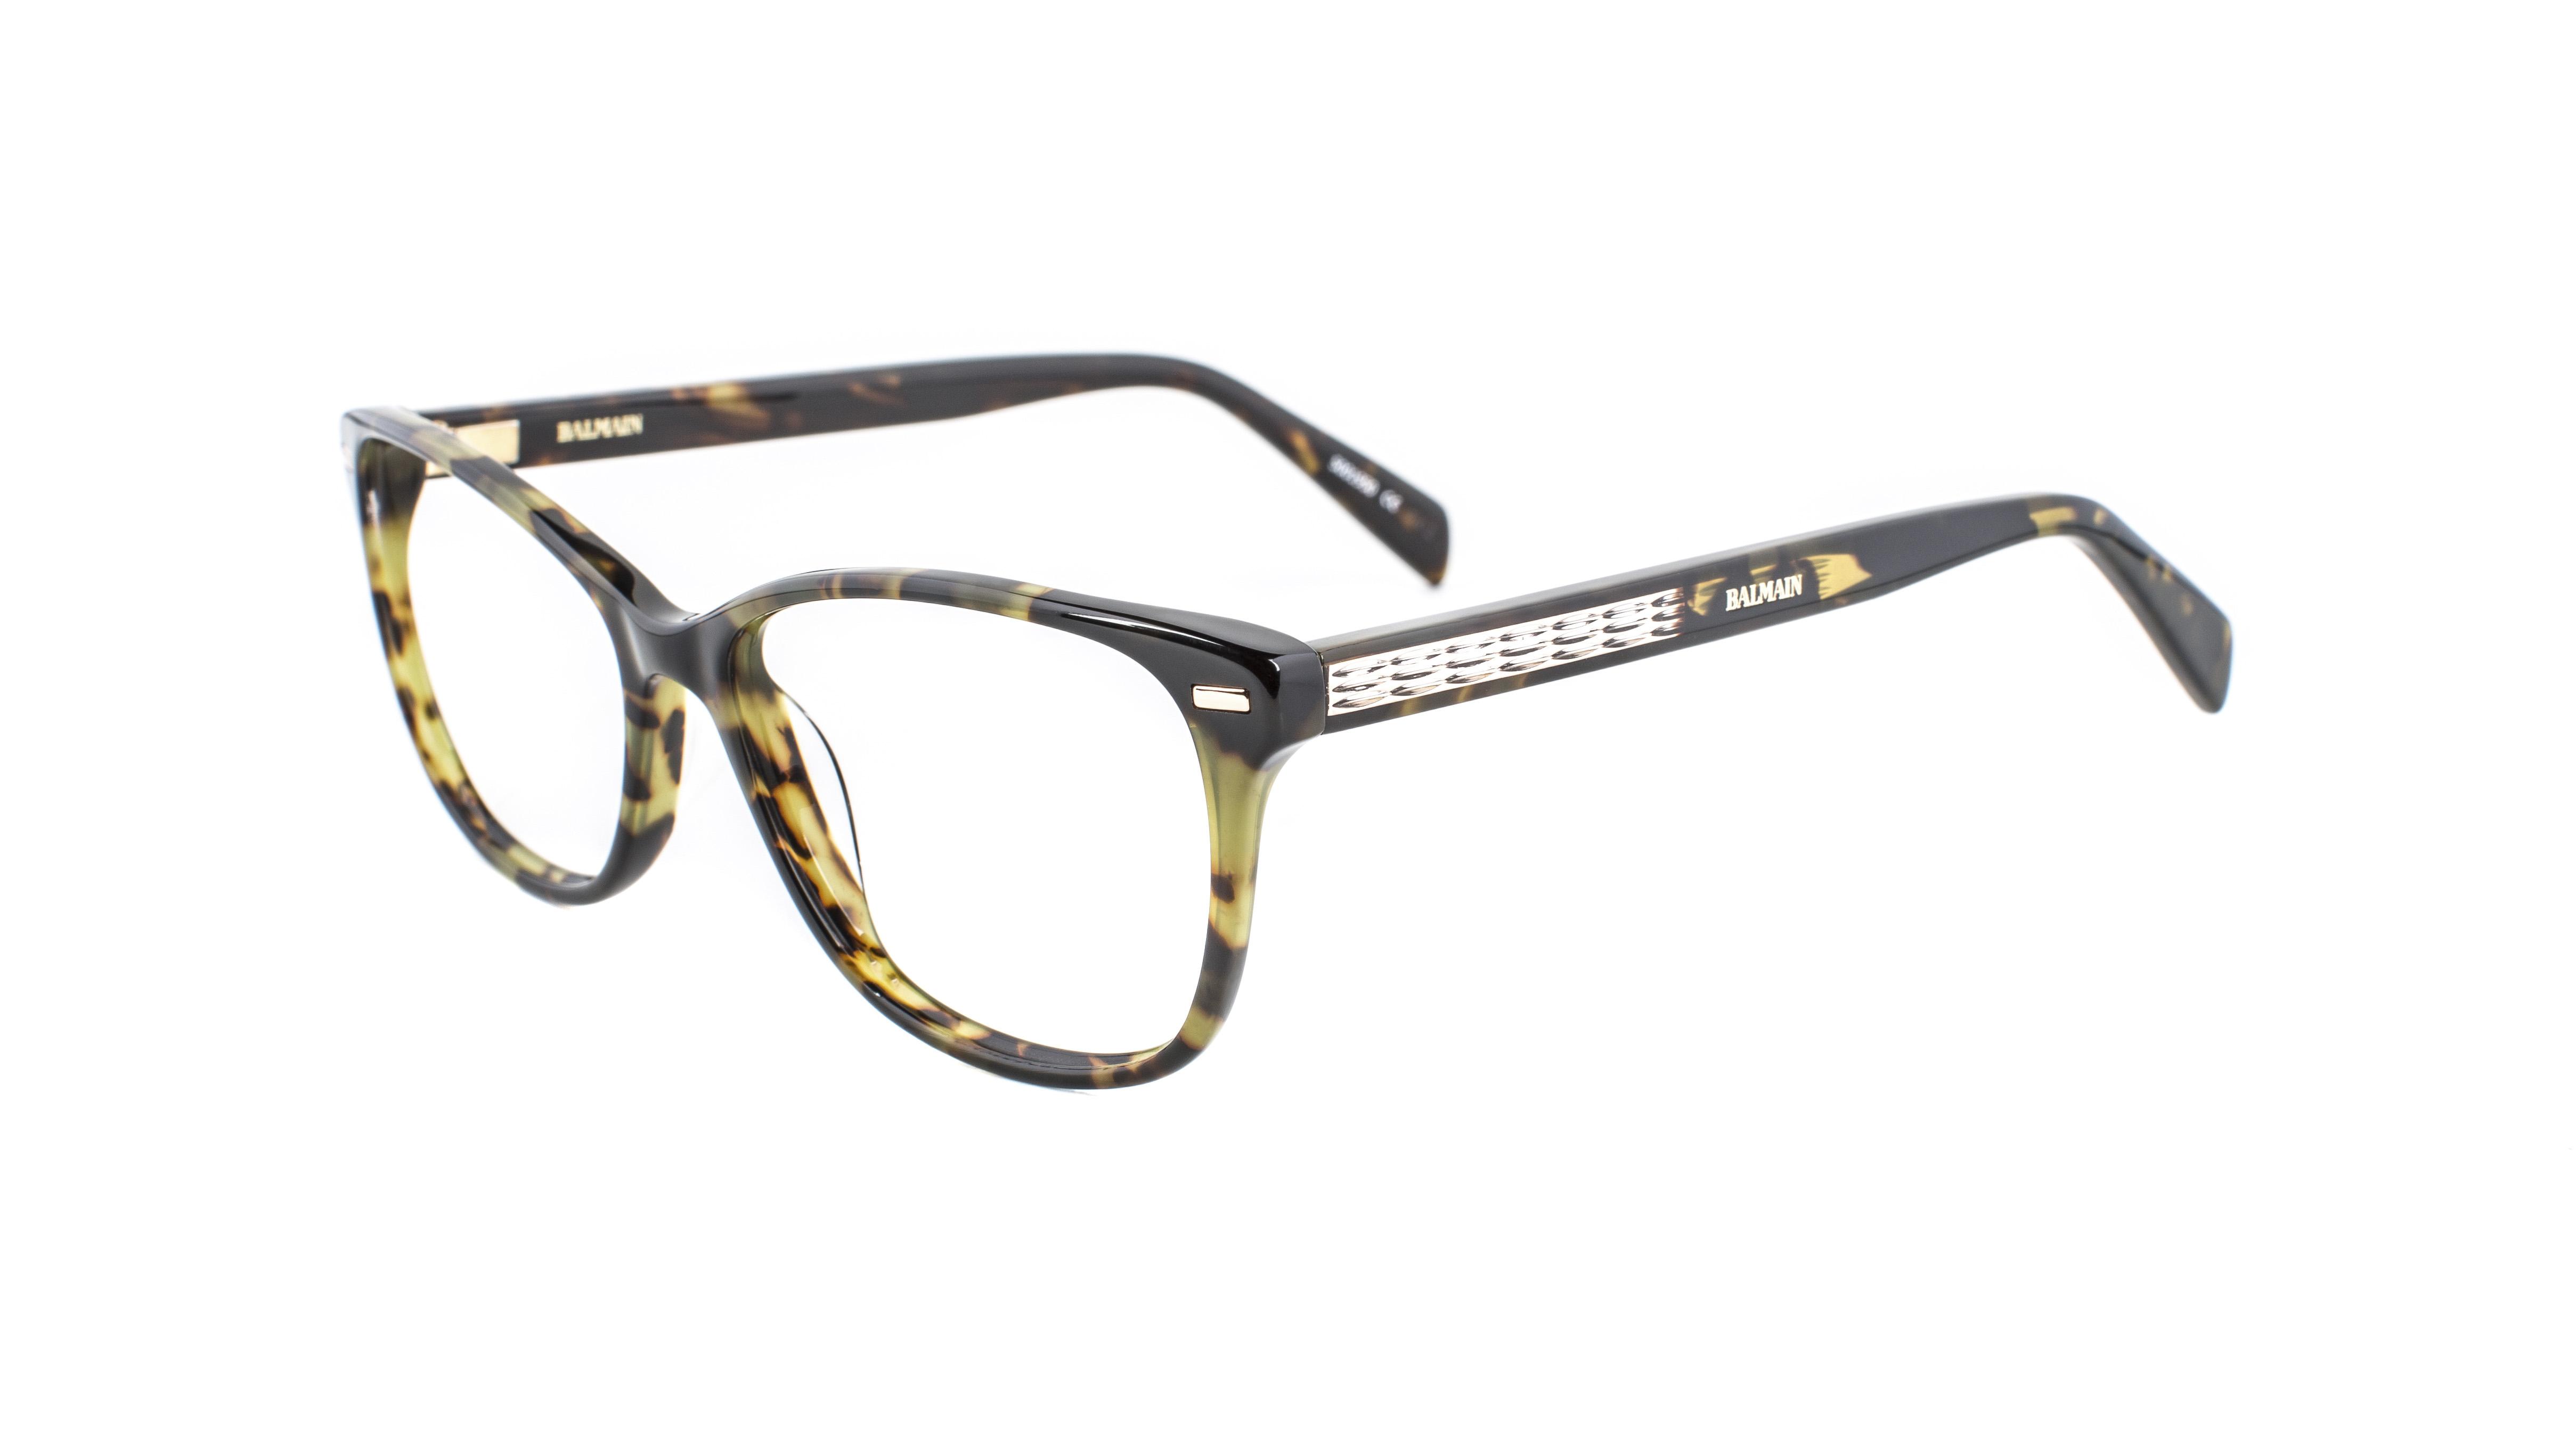 Balmain x Specsavers BL1524S 30570801 - RRP 2 pairs single vision $459 (2)